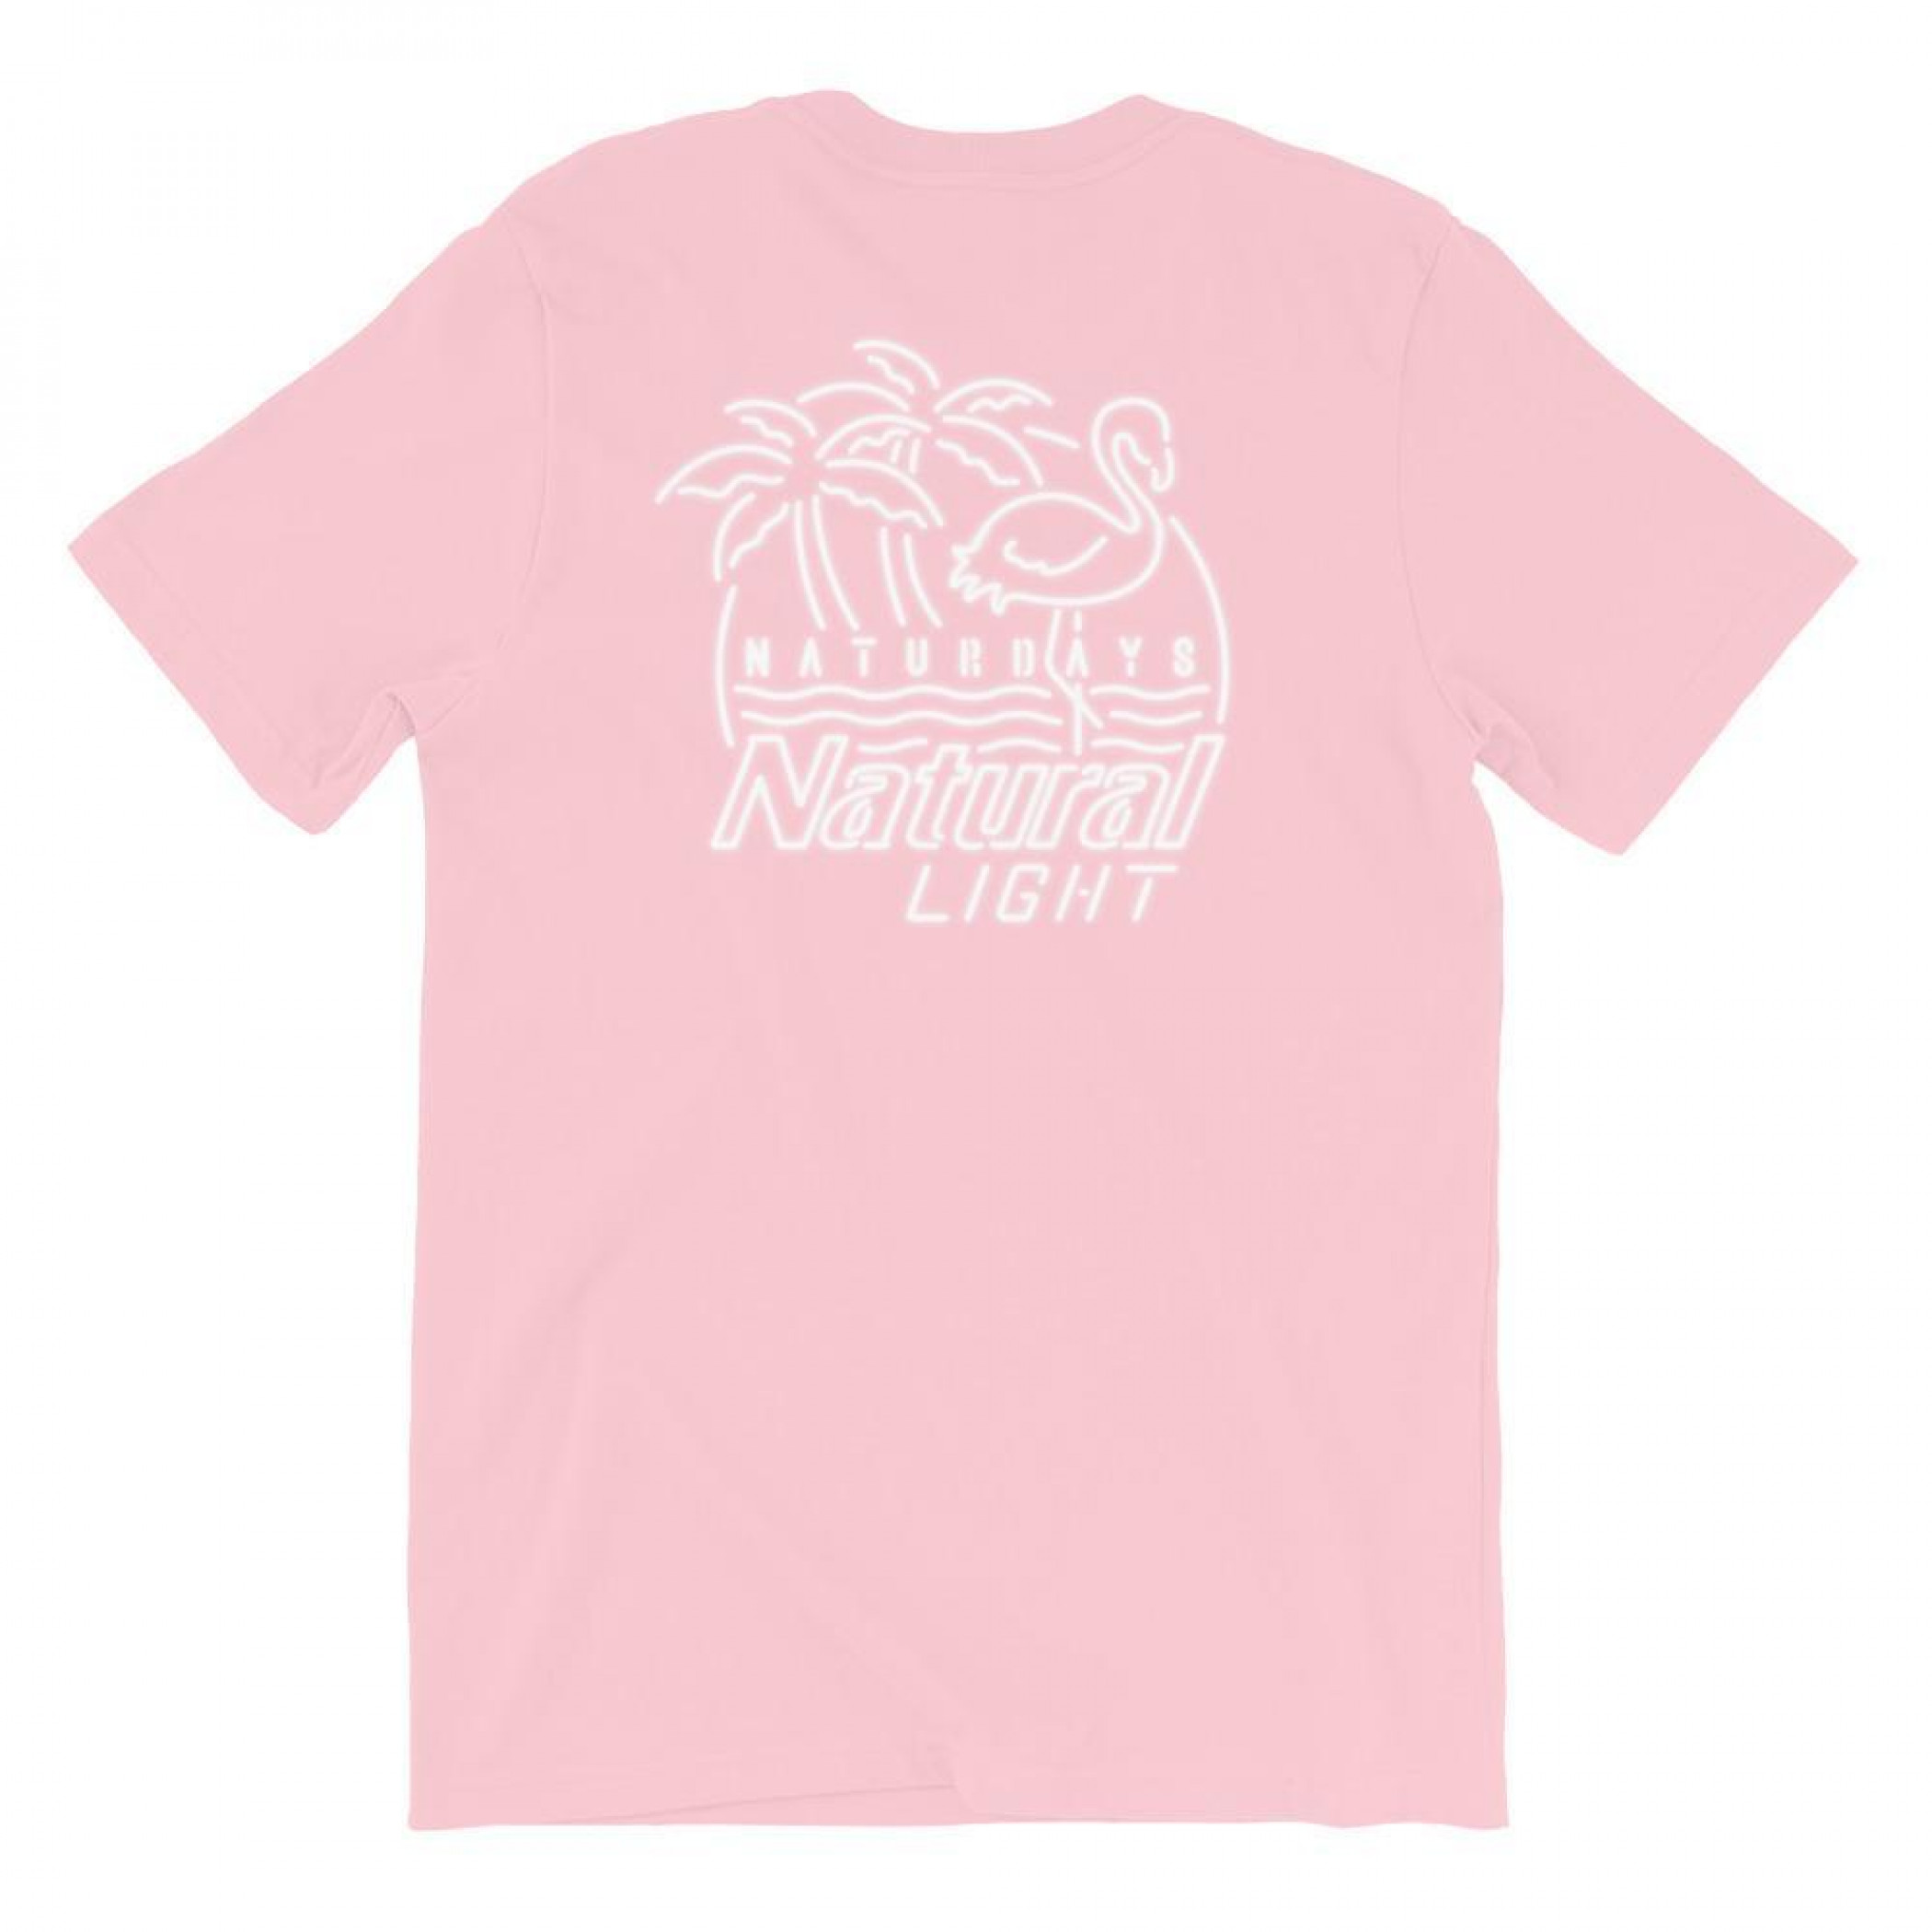 Natural Light Beer Naturdays Light Pink Men's Cotton T-Shirt